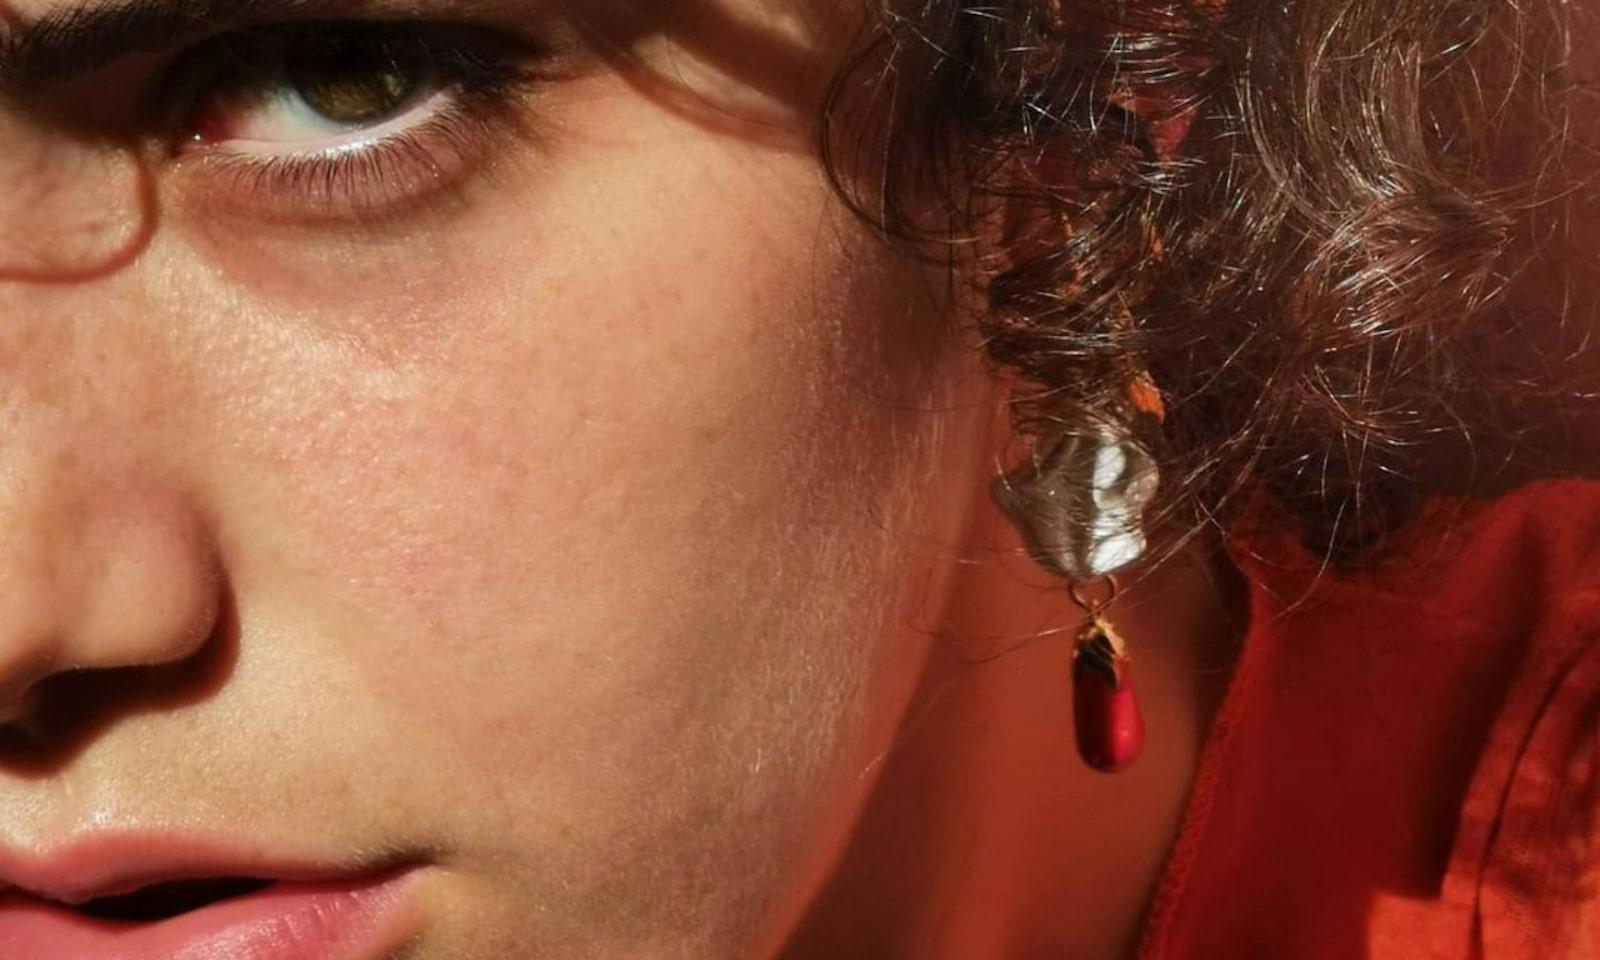 volunto woman-ownned jewelry feminism vulvas menstruation female friendship sevilla spain